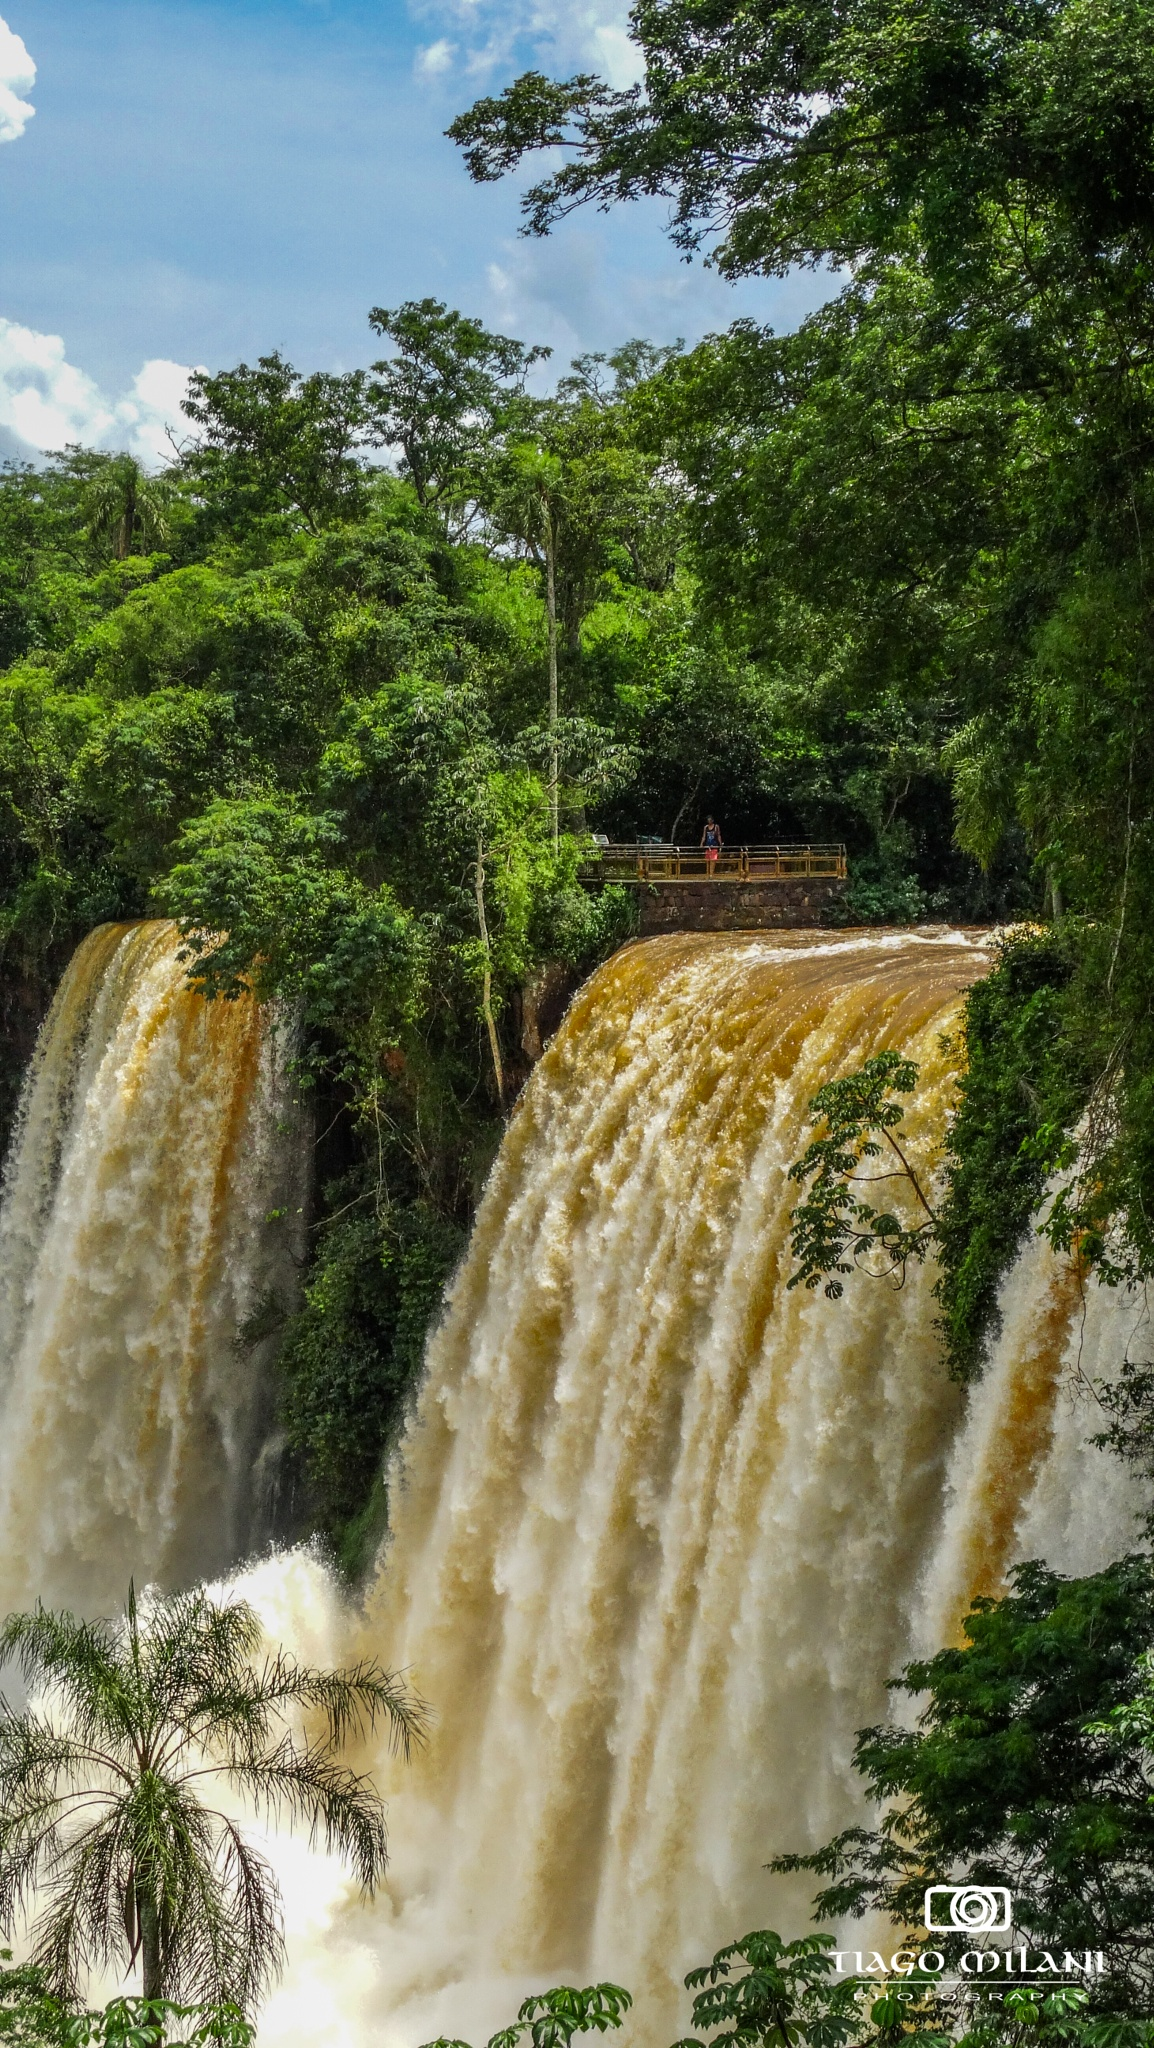 Iguazu Falls by Tiago Milani